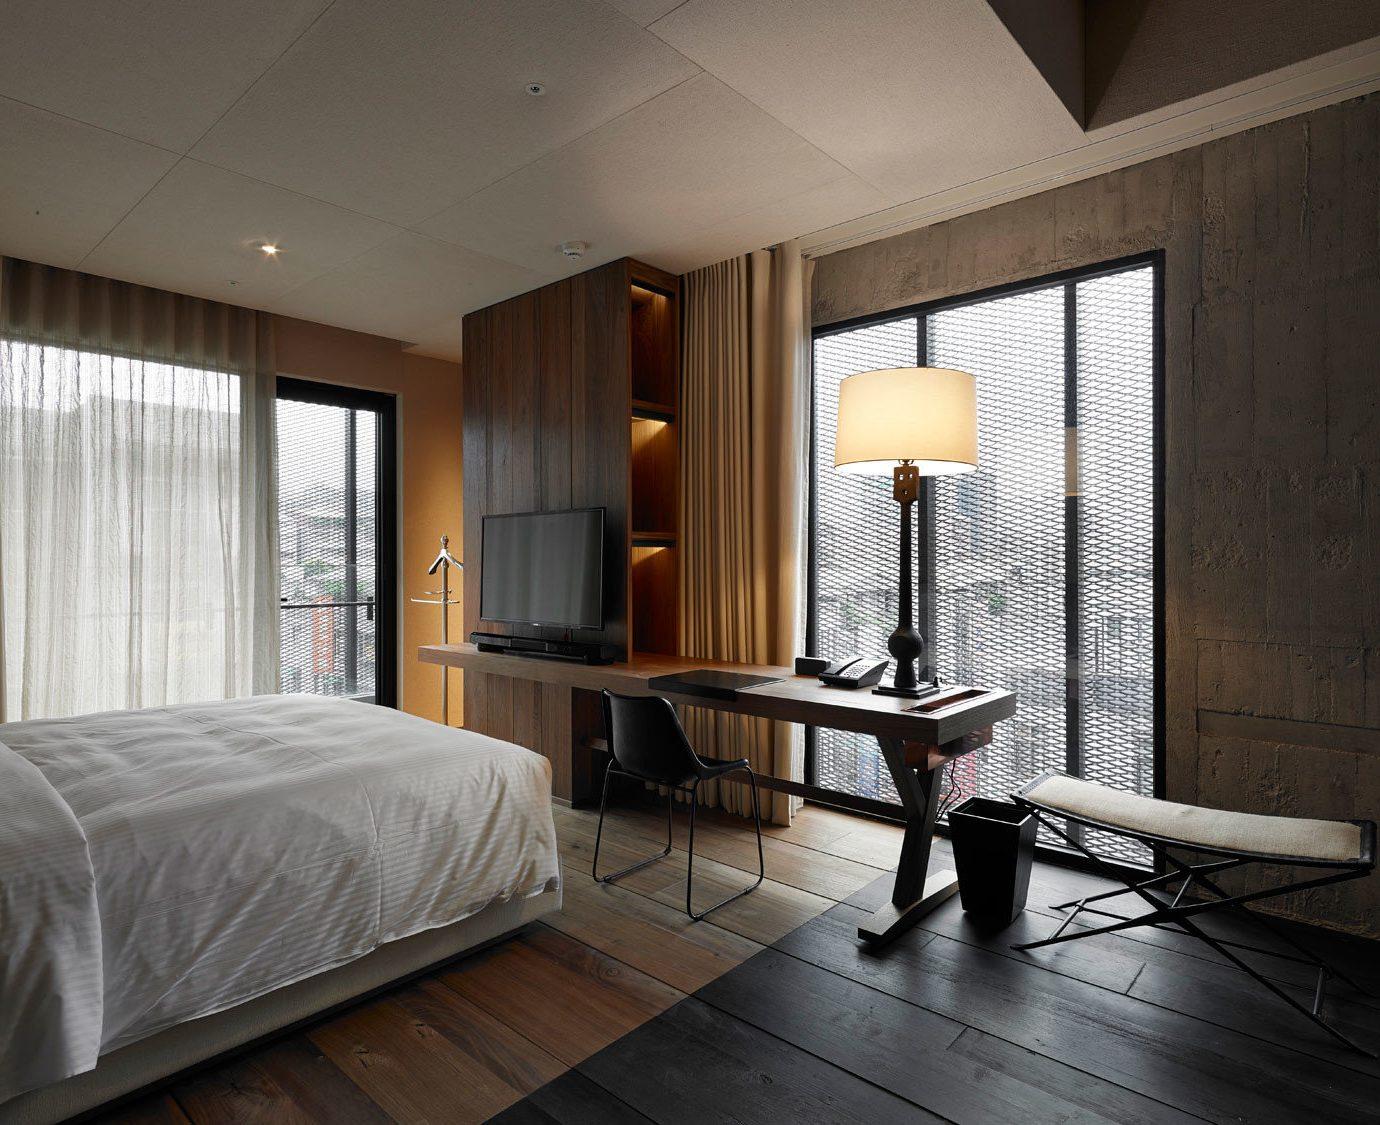 Bedroom property hardwood home Suite living room wood flooring lamp